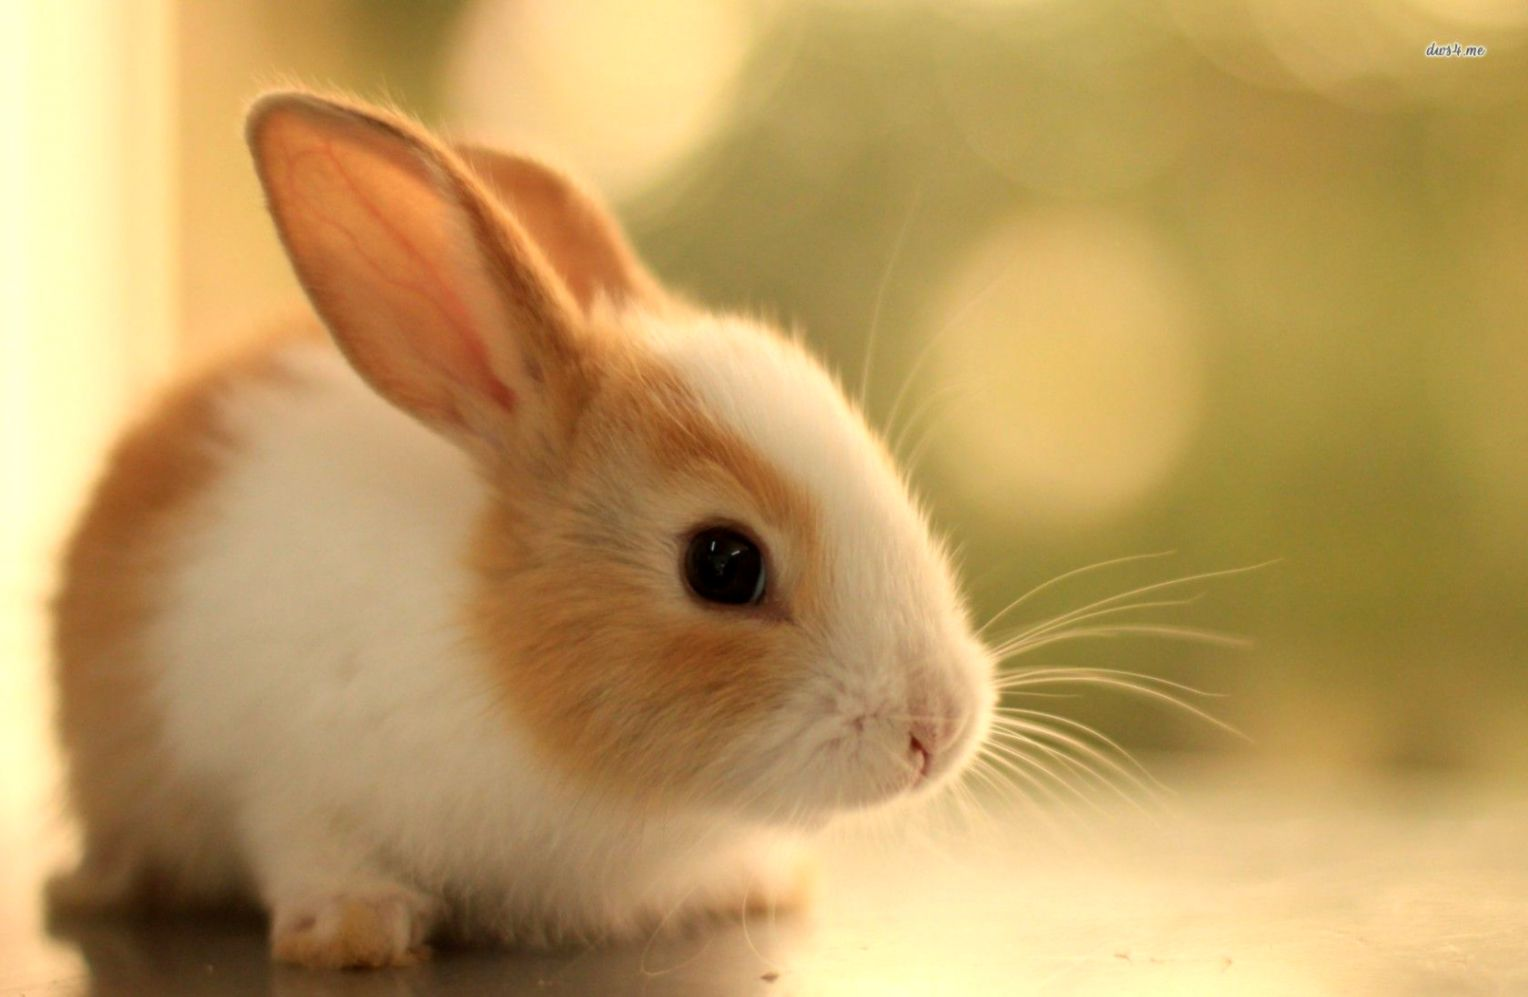 Cute Bunny Wallpaper Wallpapers Minimalist